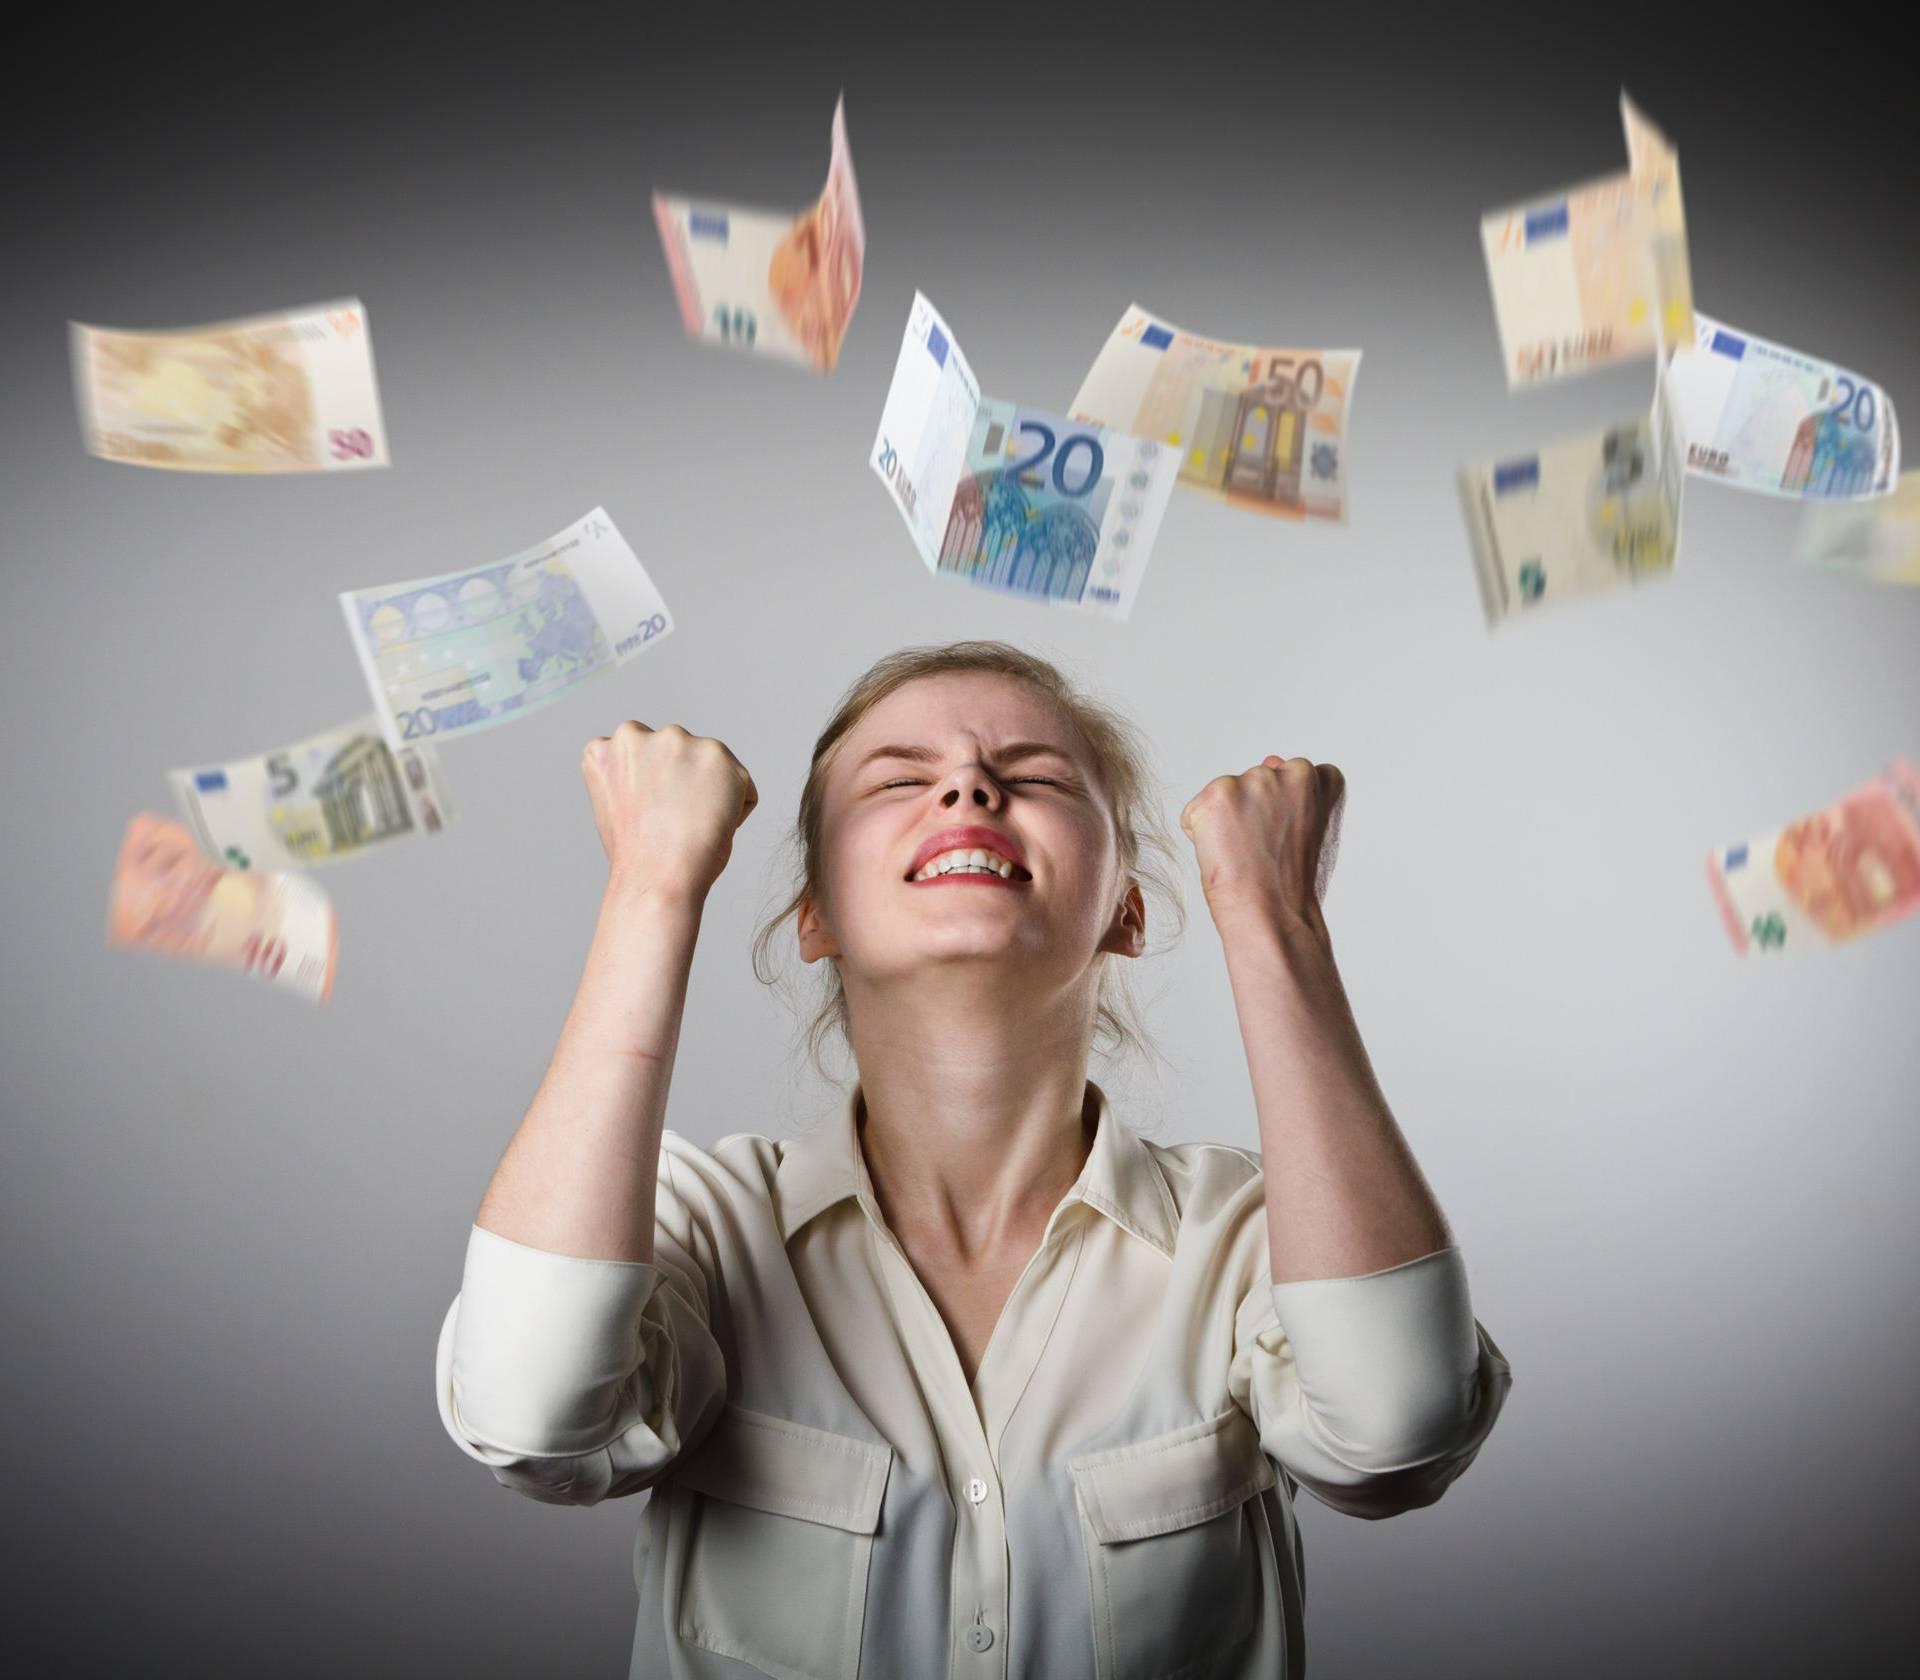 Zabluda 'kockanja': Prate niz pa misle da je riječ o pravilu